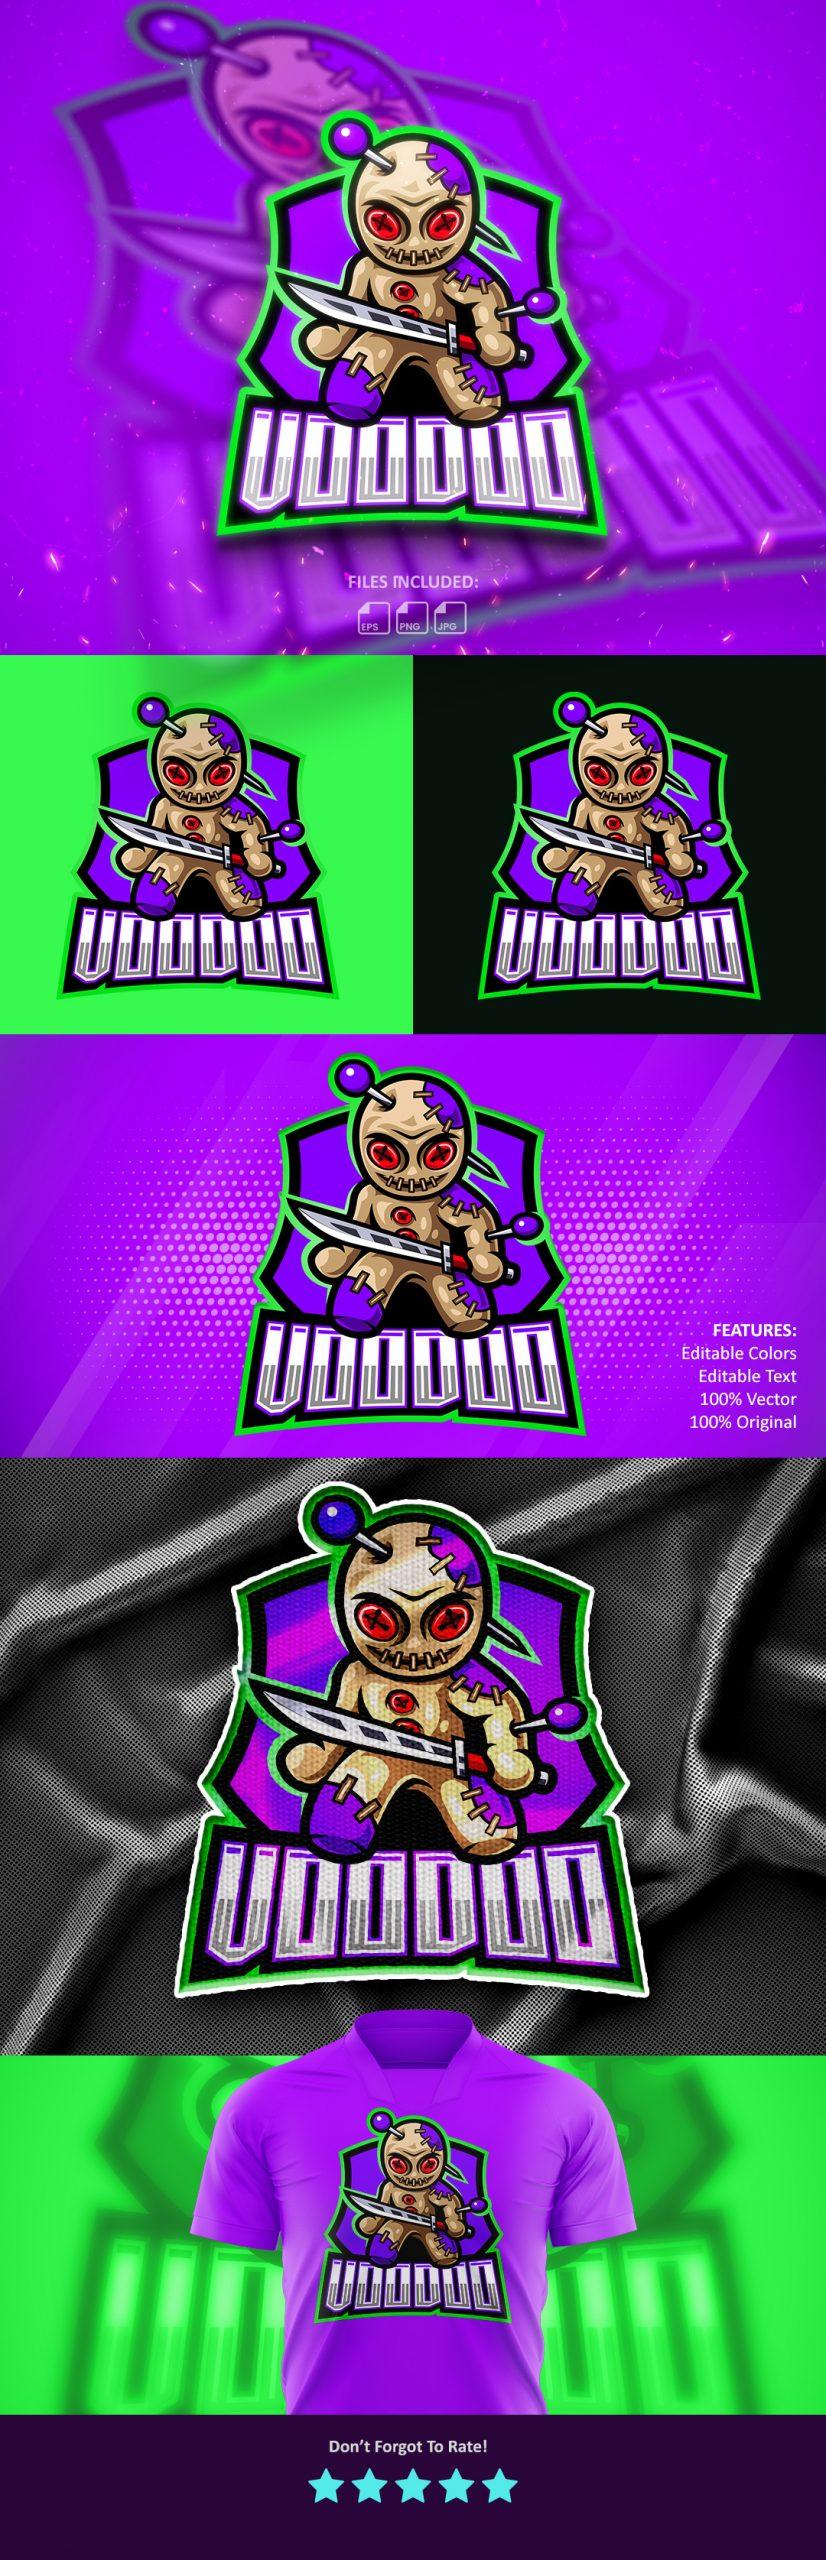 Free-VooDoo-Mascot-Logo-Download